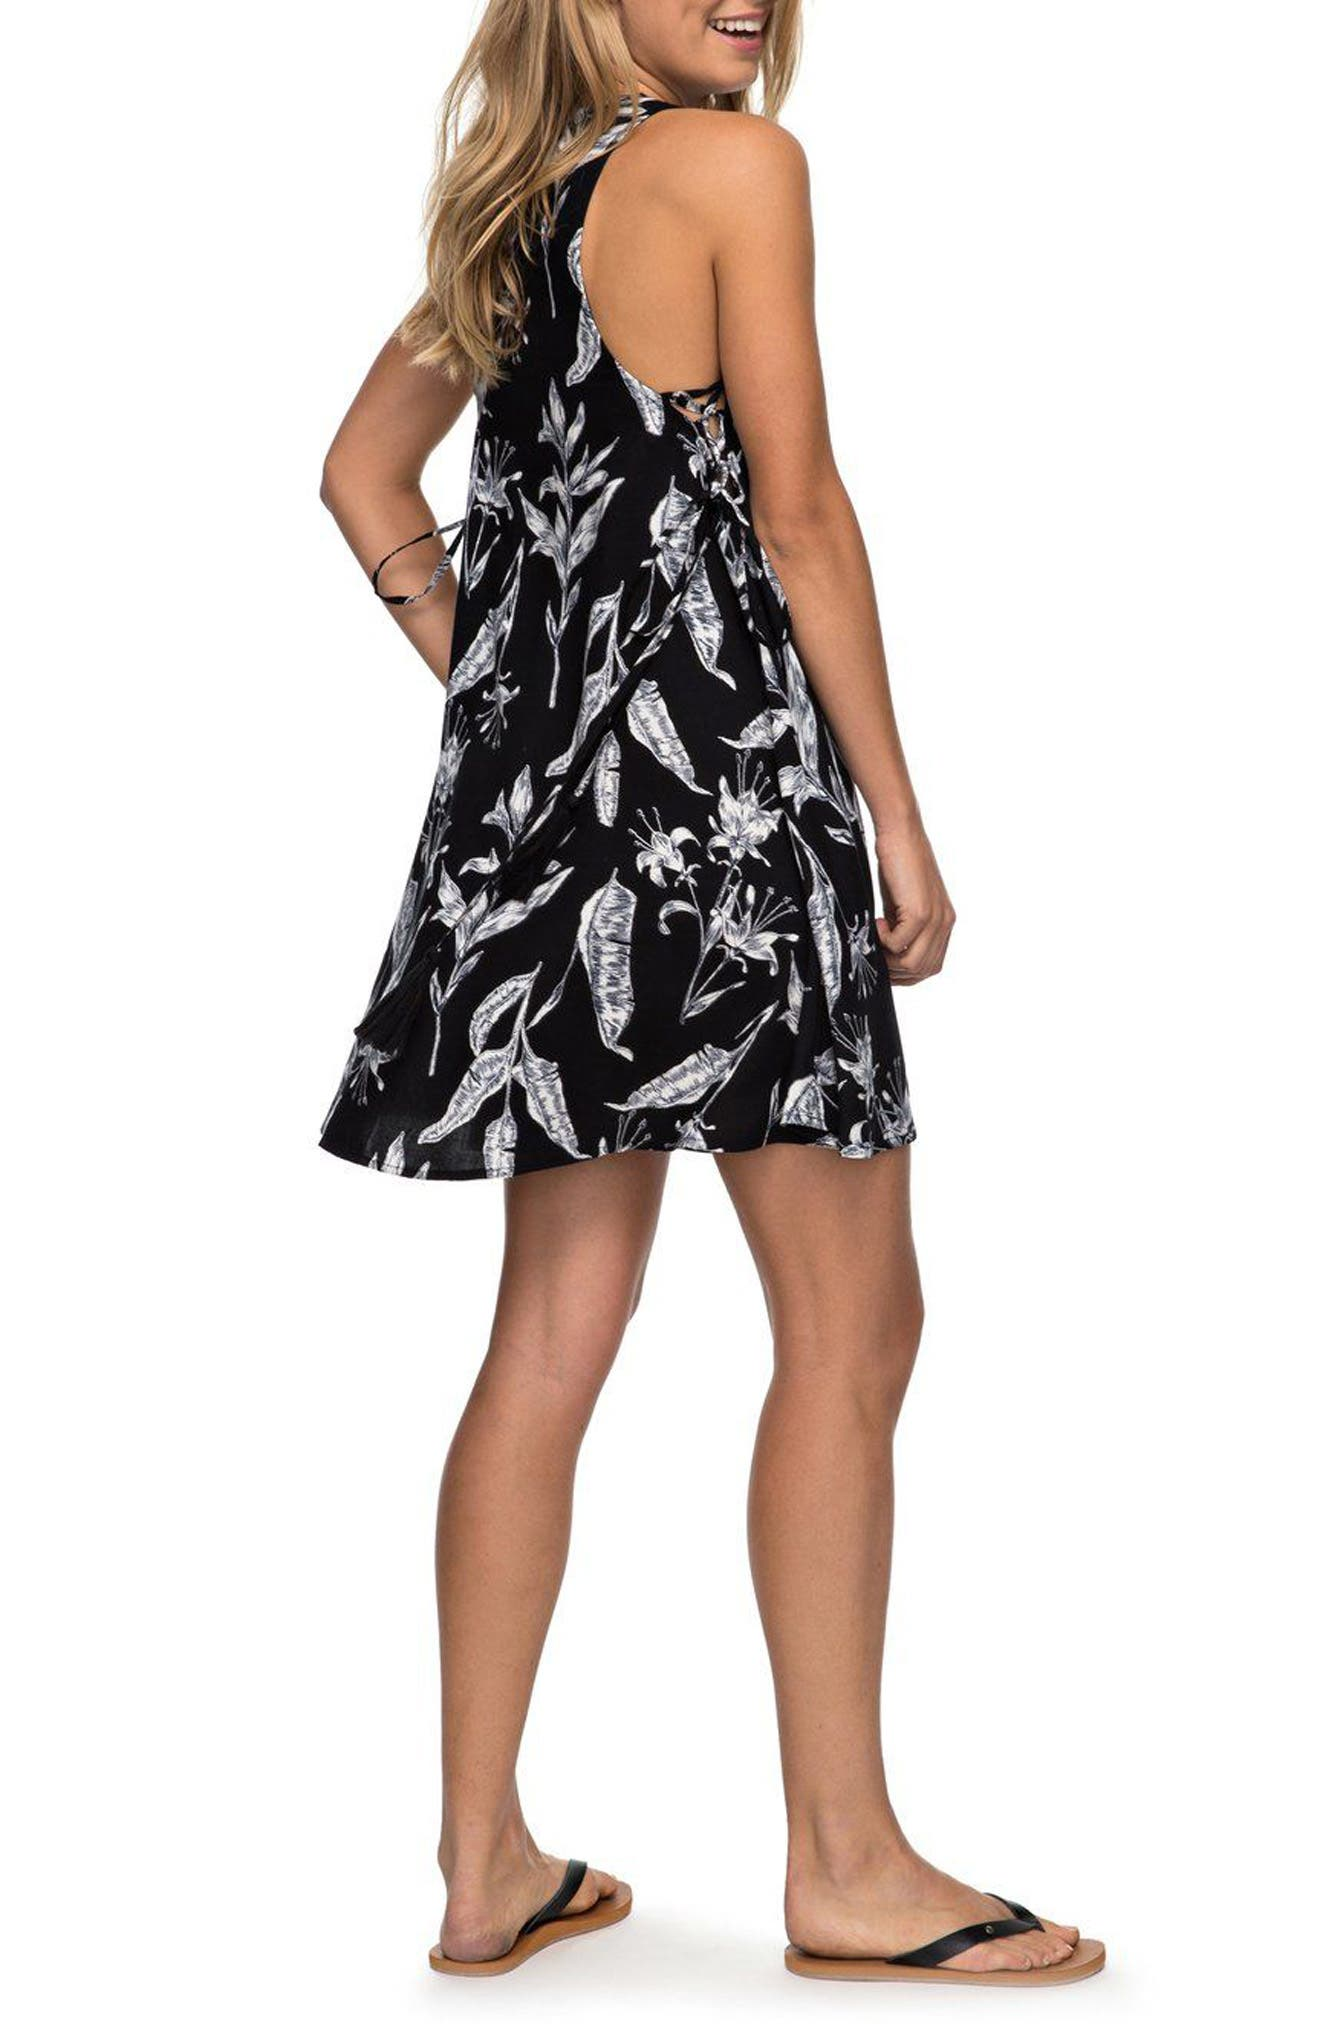 Tomorrow's Dress,                             Alternate thumbnail 2, color,                             002